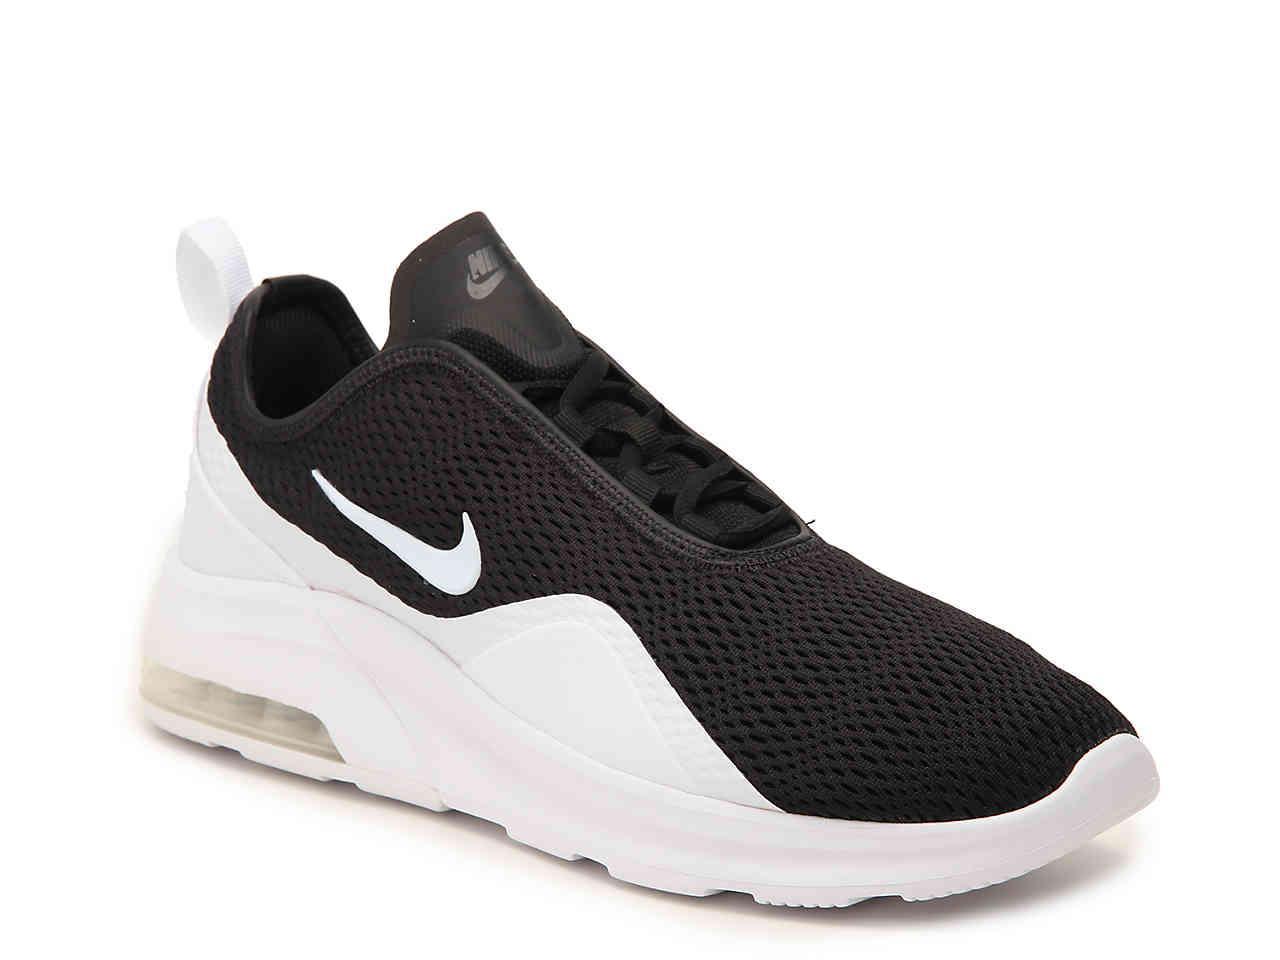 cb694e889fbf Lyst - Nike Air Max Motion 2 Sneaker in Black for Men